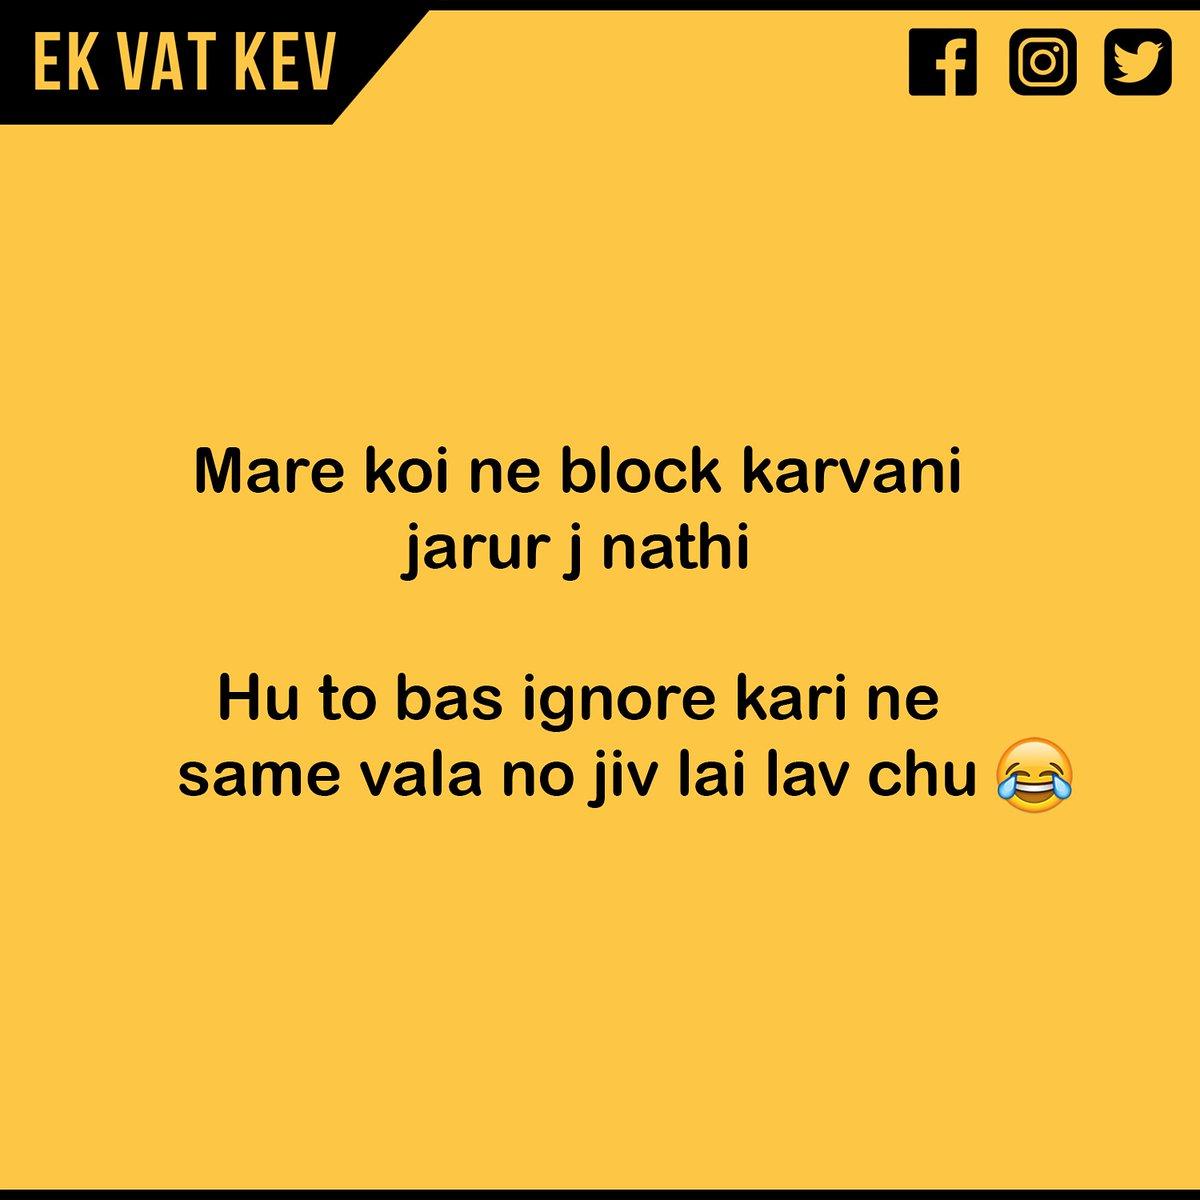 Tame kono jiv lidho che 😜 👉 Follow : @ekvatkev .  #gujarati #gujju #gujju_comedy #surat #ahmedabad #rajkot #bharuch #navsari #valsad #mumbai #OneplusMcLaren #swara_aunty #TuesdayMotivation